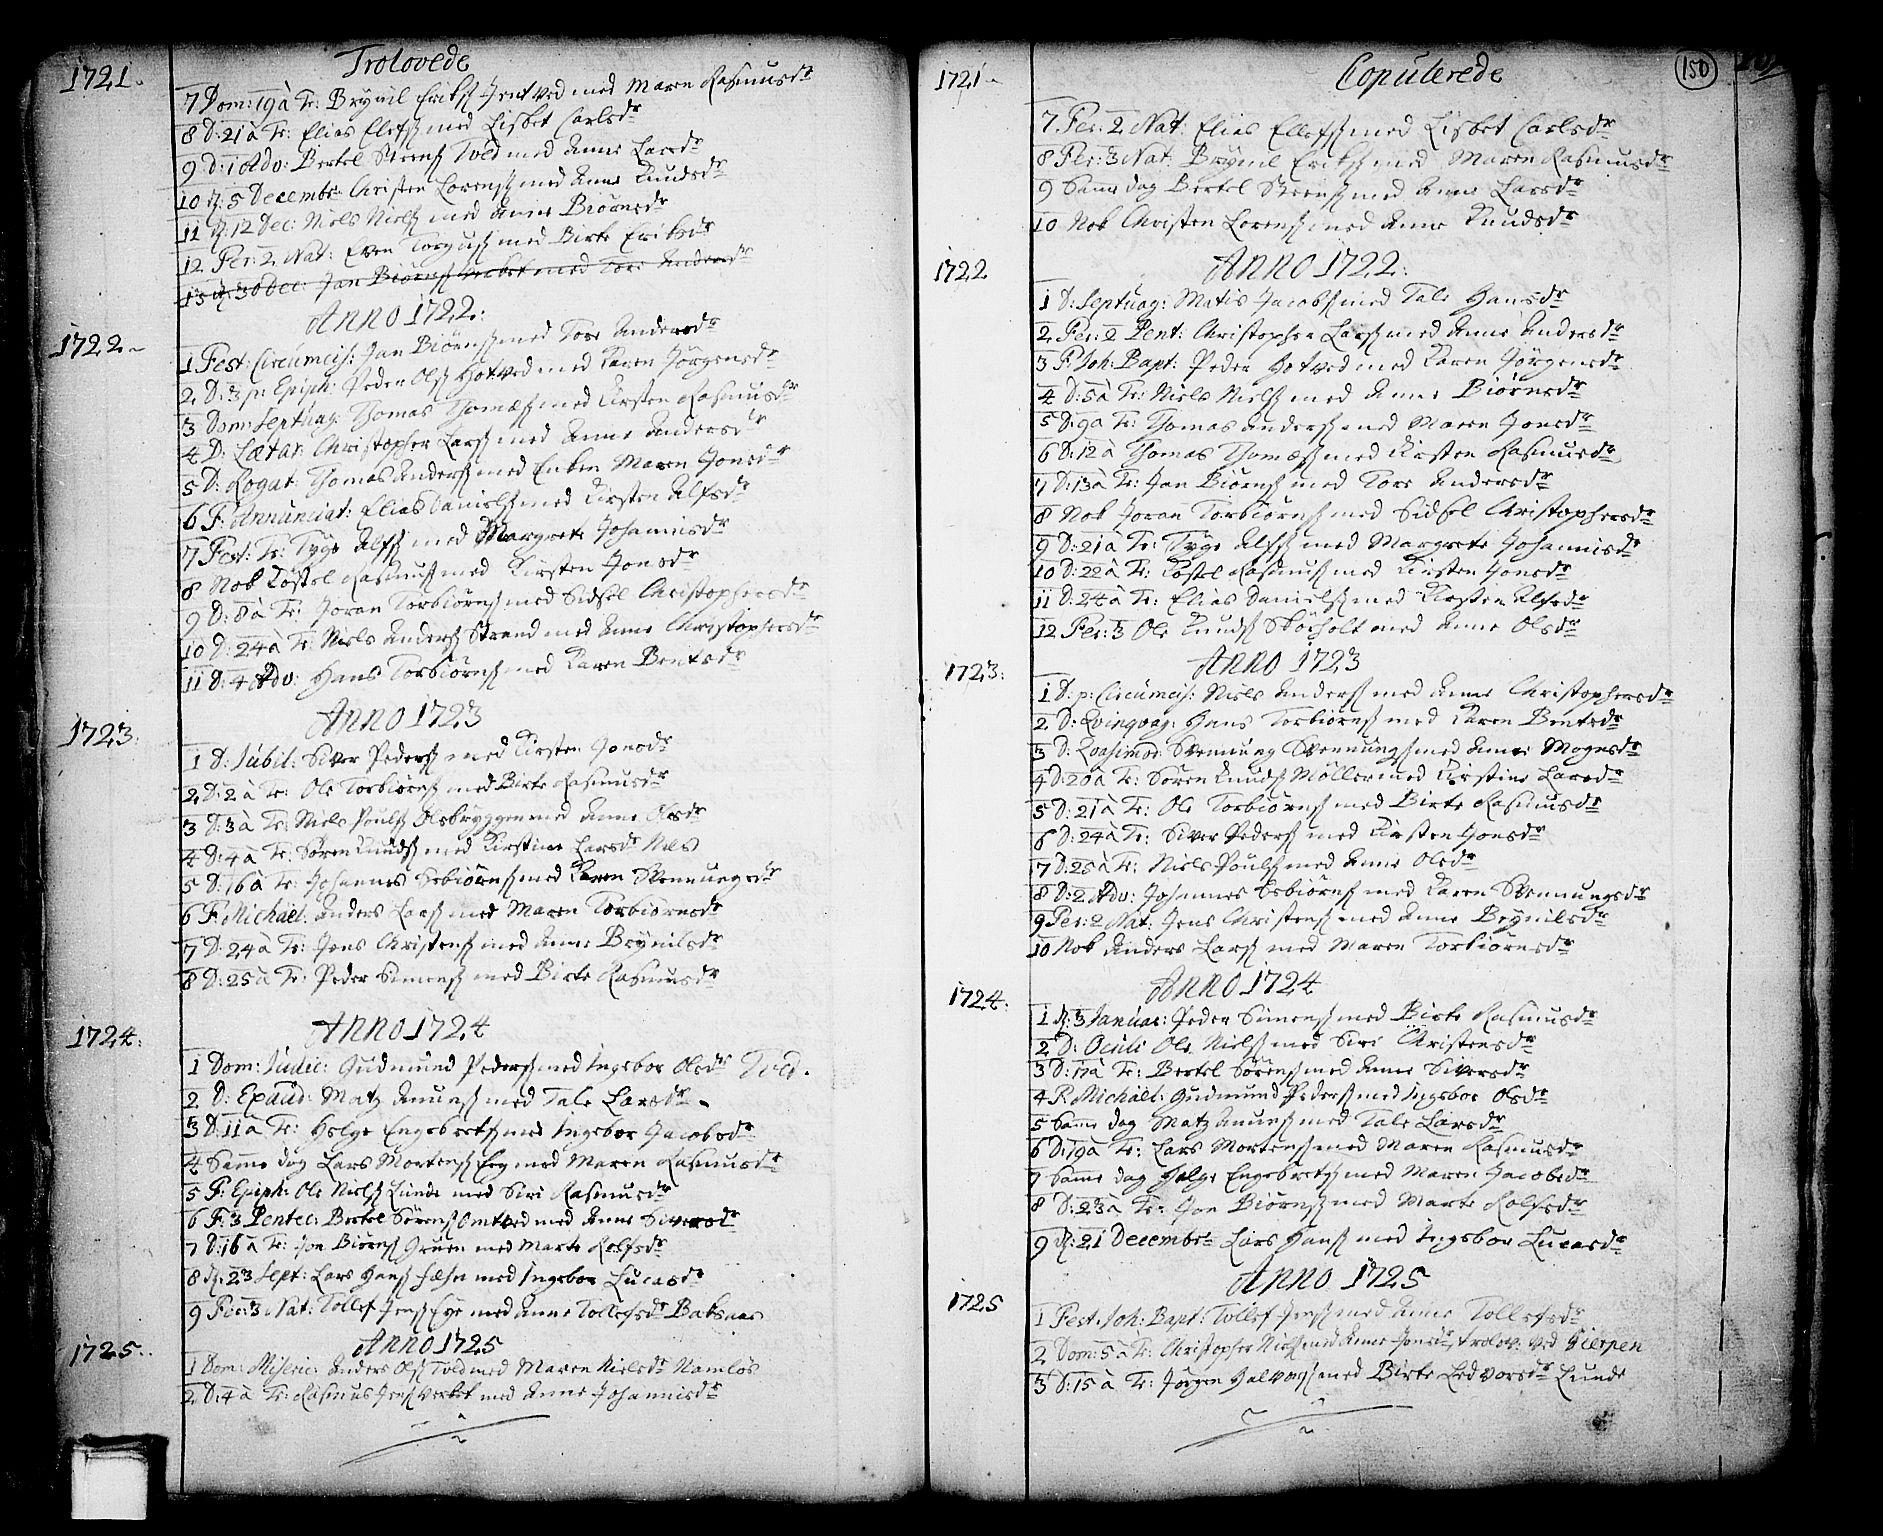 SAKO, Holla kirkebøker, F/Fa/L0001: Ministerialbok nr. 1, 1717-1779, s. 150